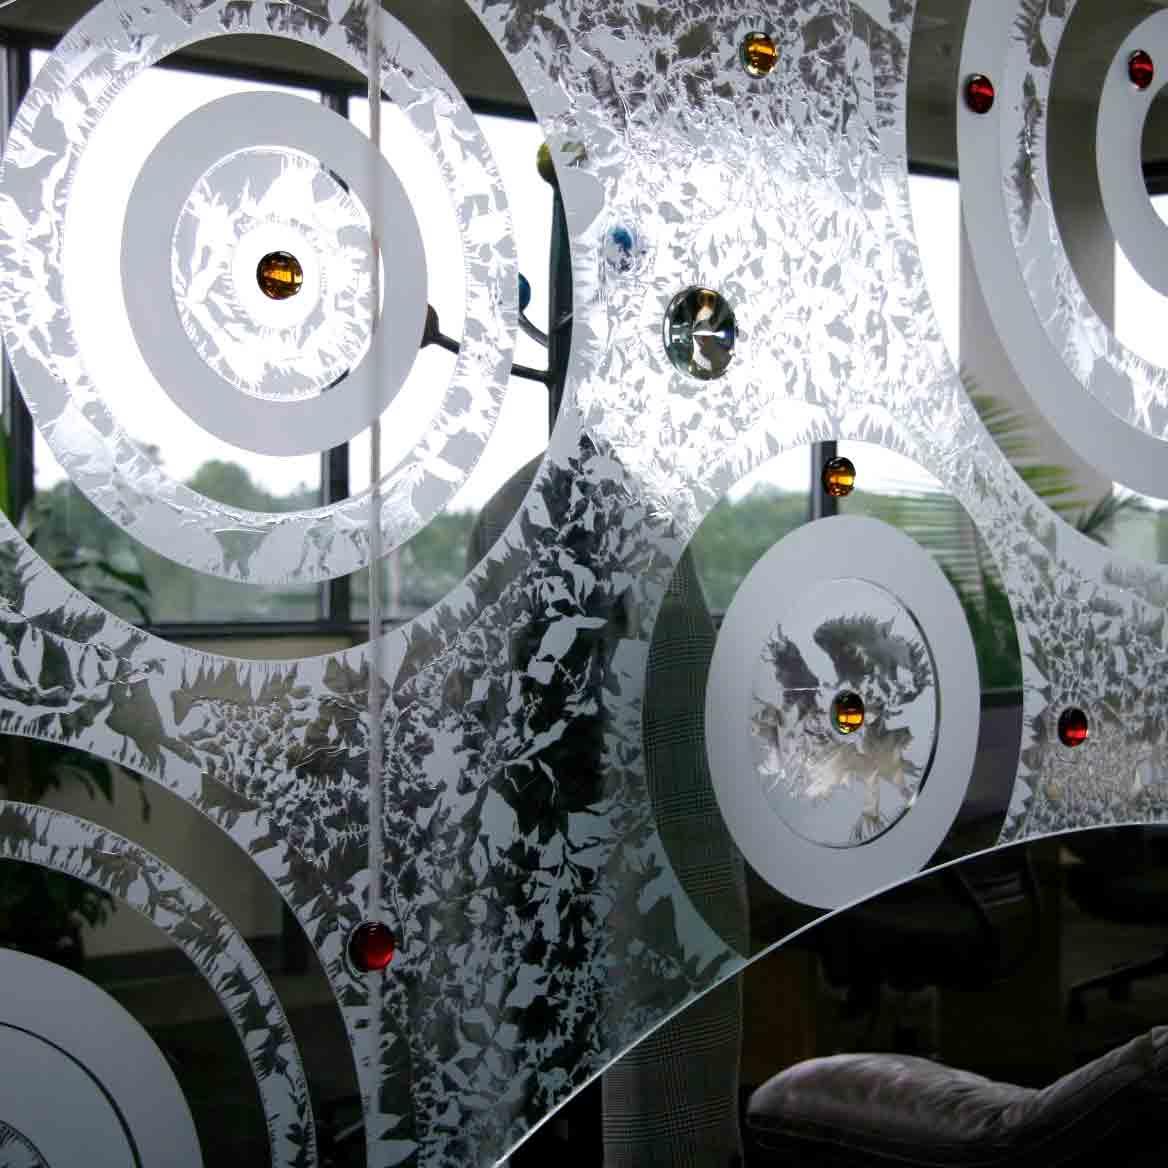 Glass Art Decor Center of the Earth Nancy Gong